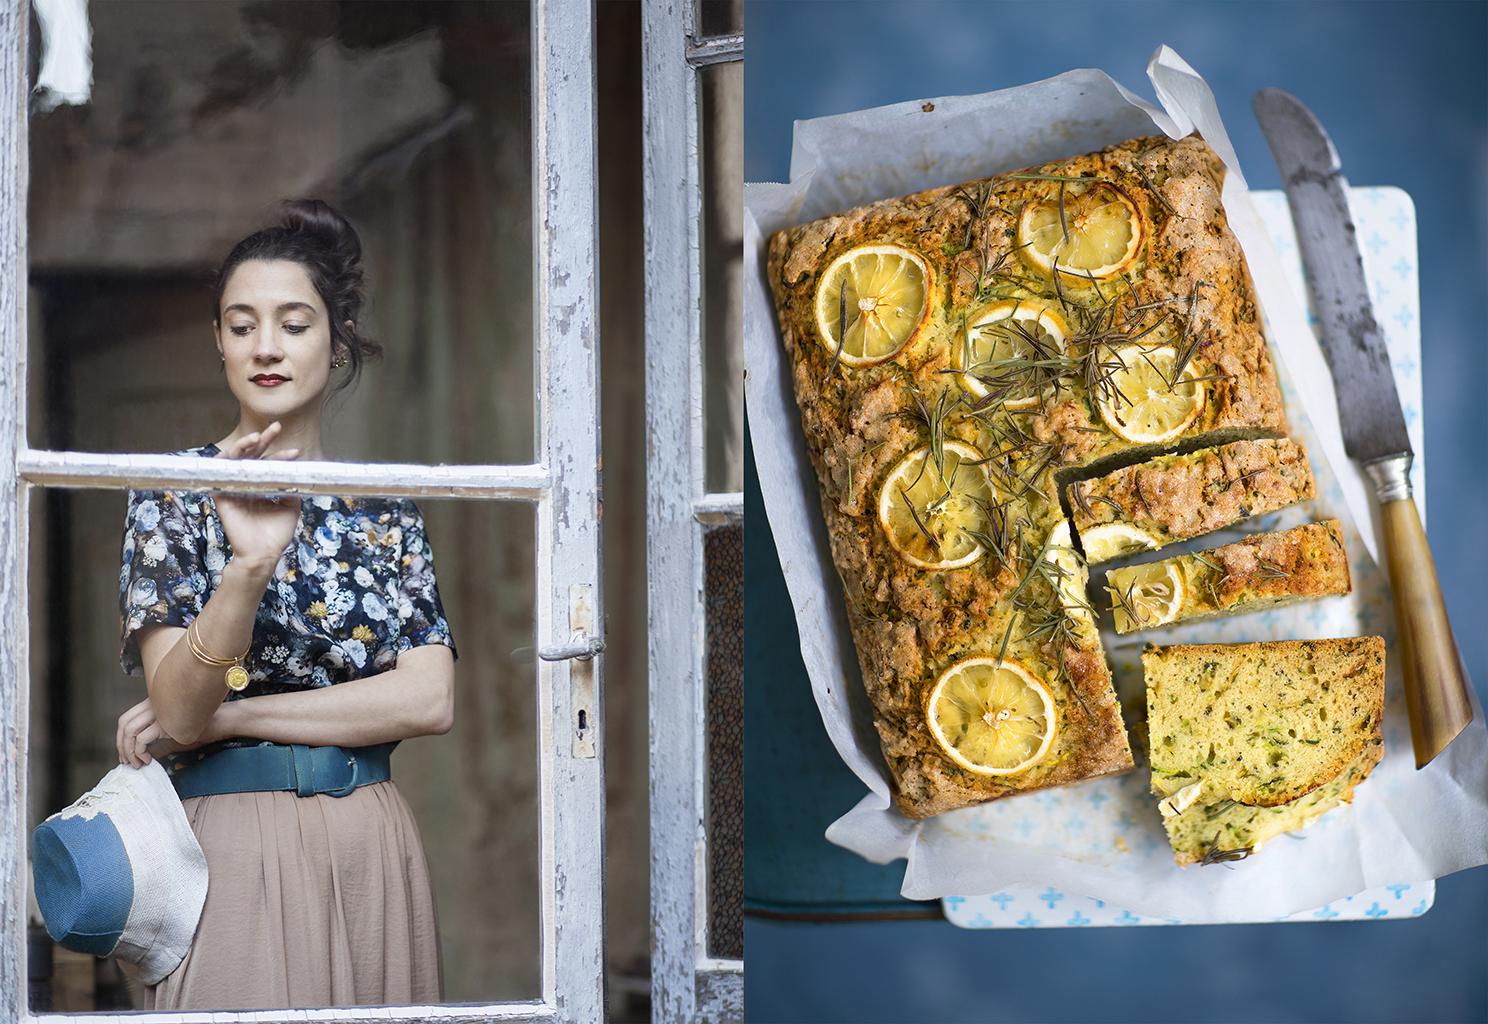 Stefania Giorgi Food Portraits Lifestyle and Interiors photographer | SAGE AND ROSEMARY